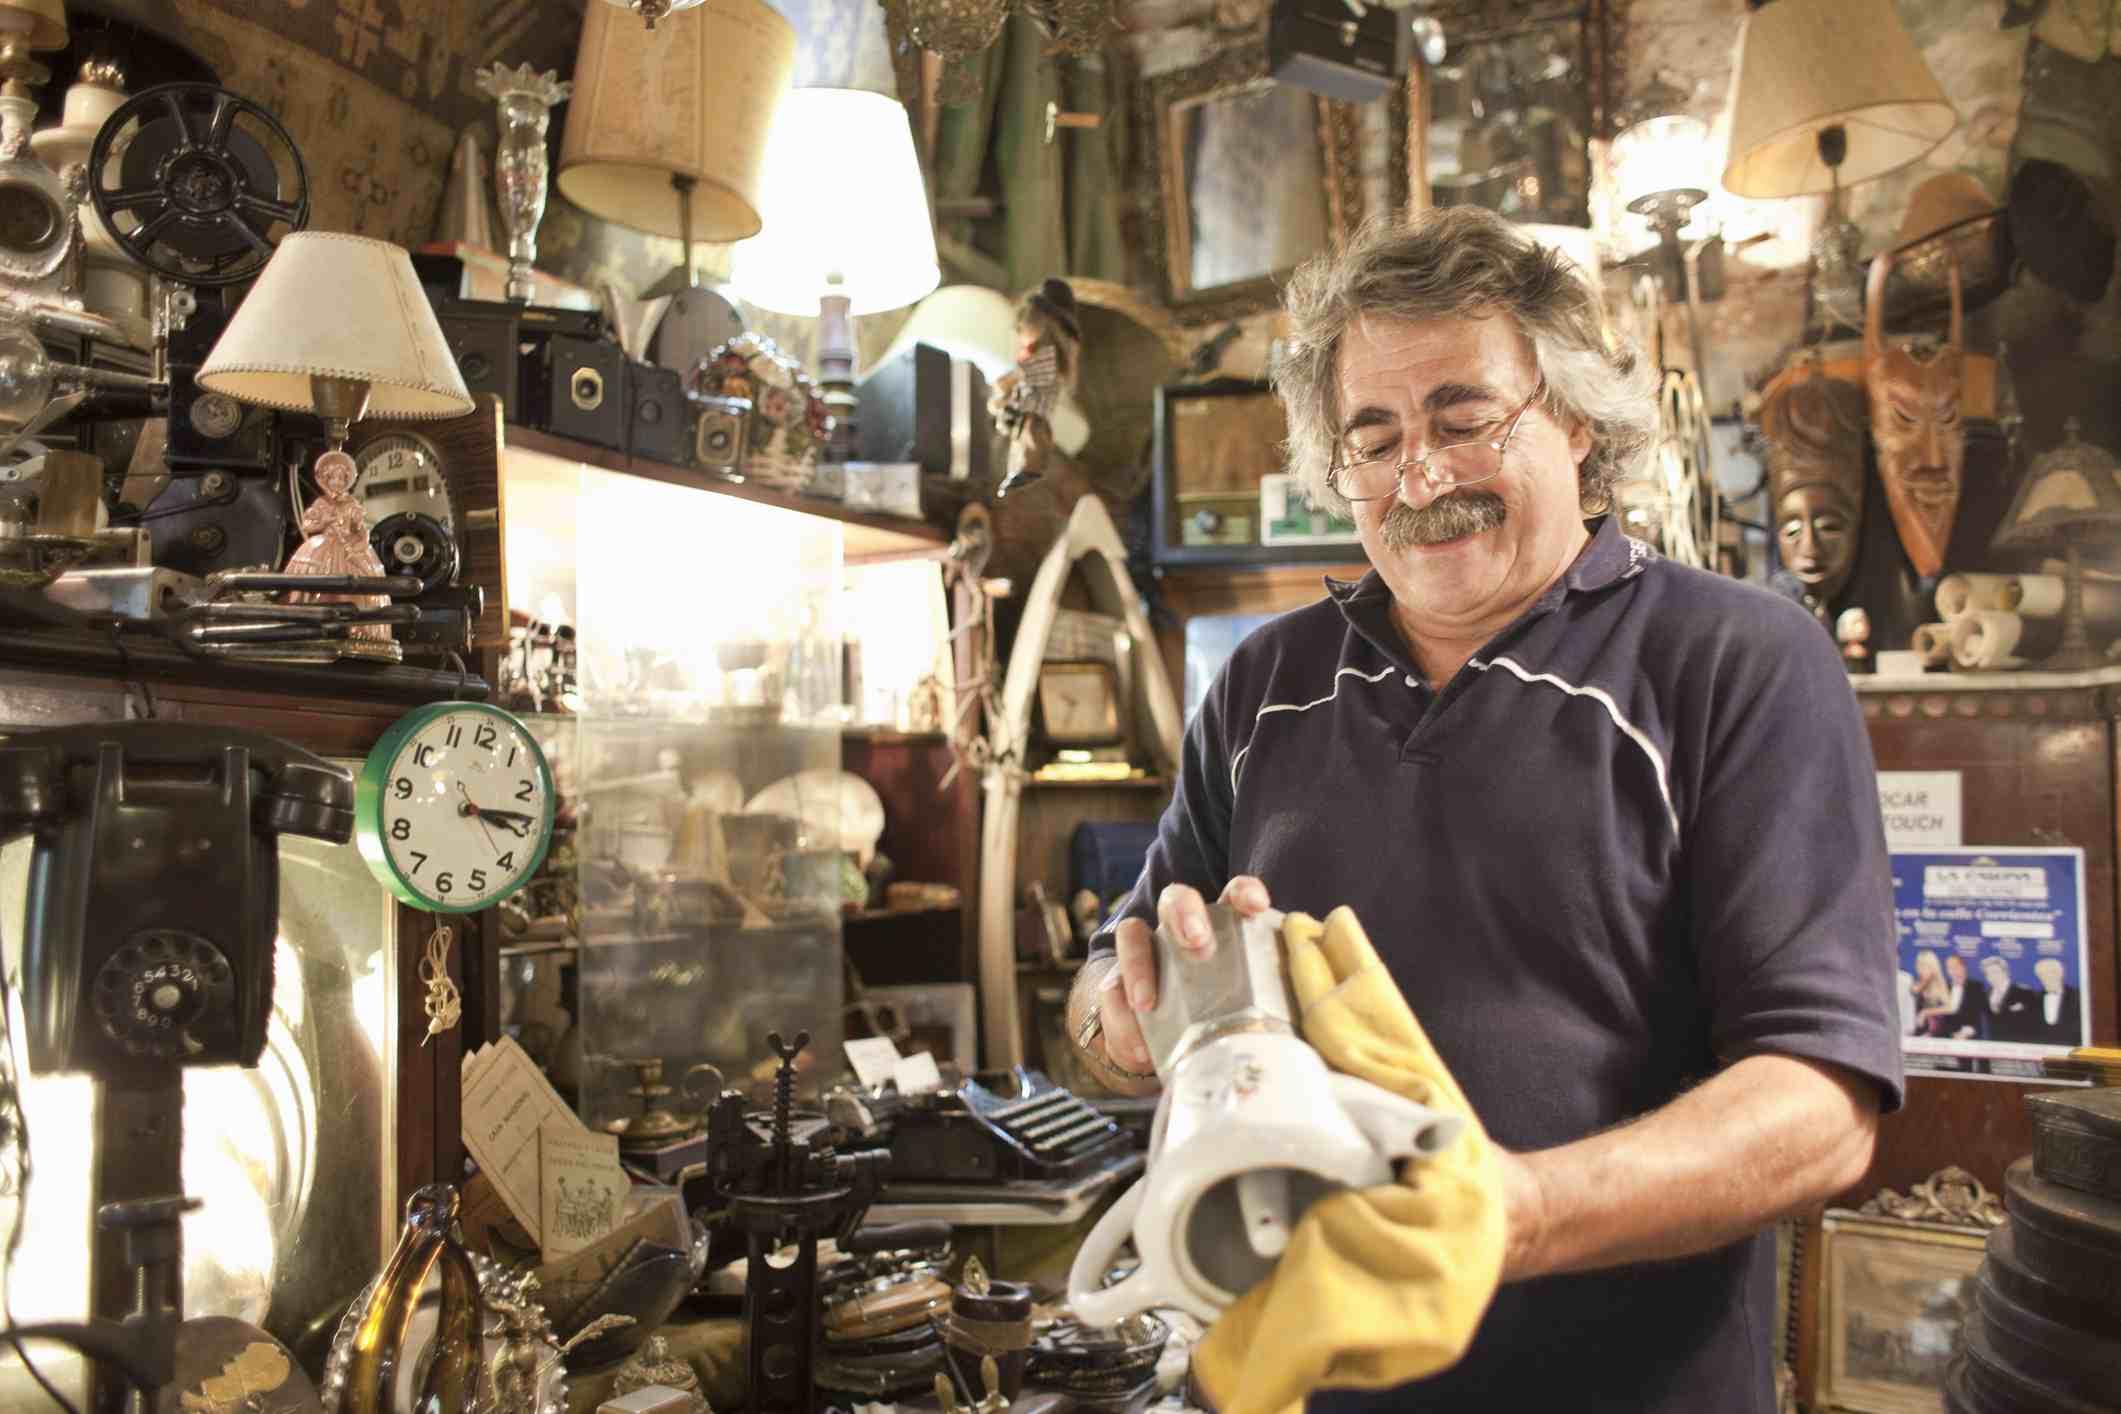 Polishing antiques